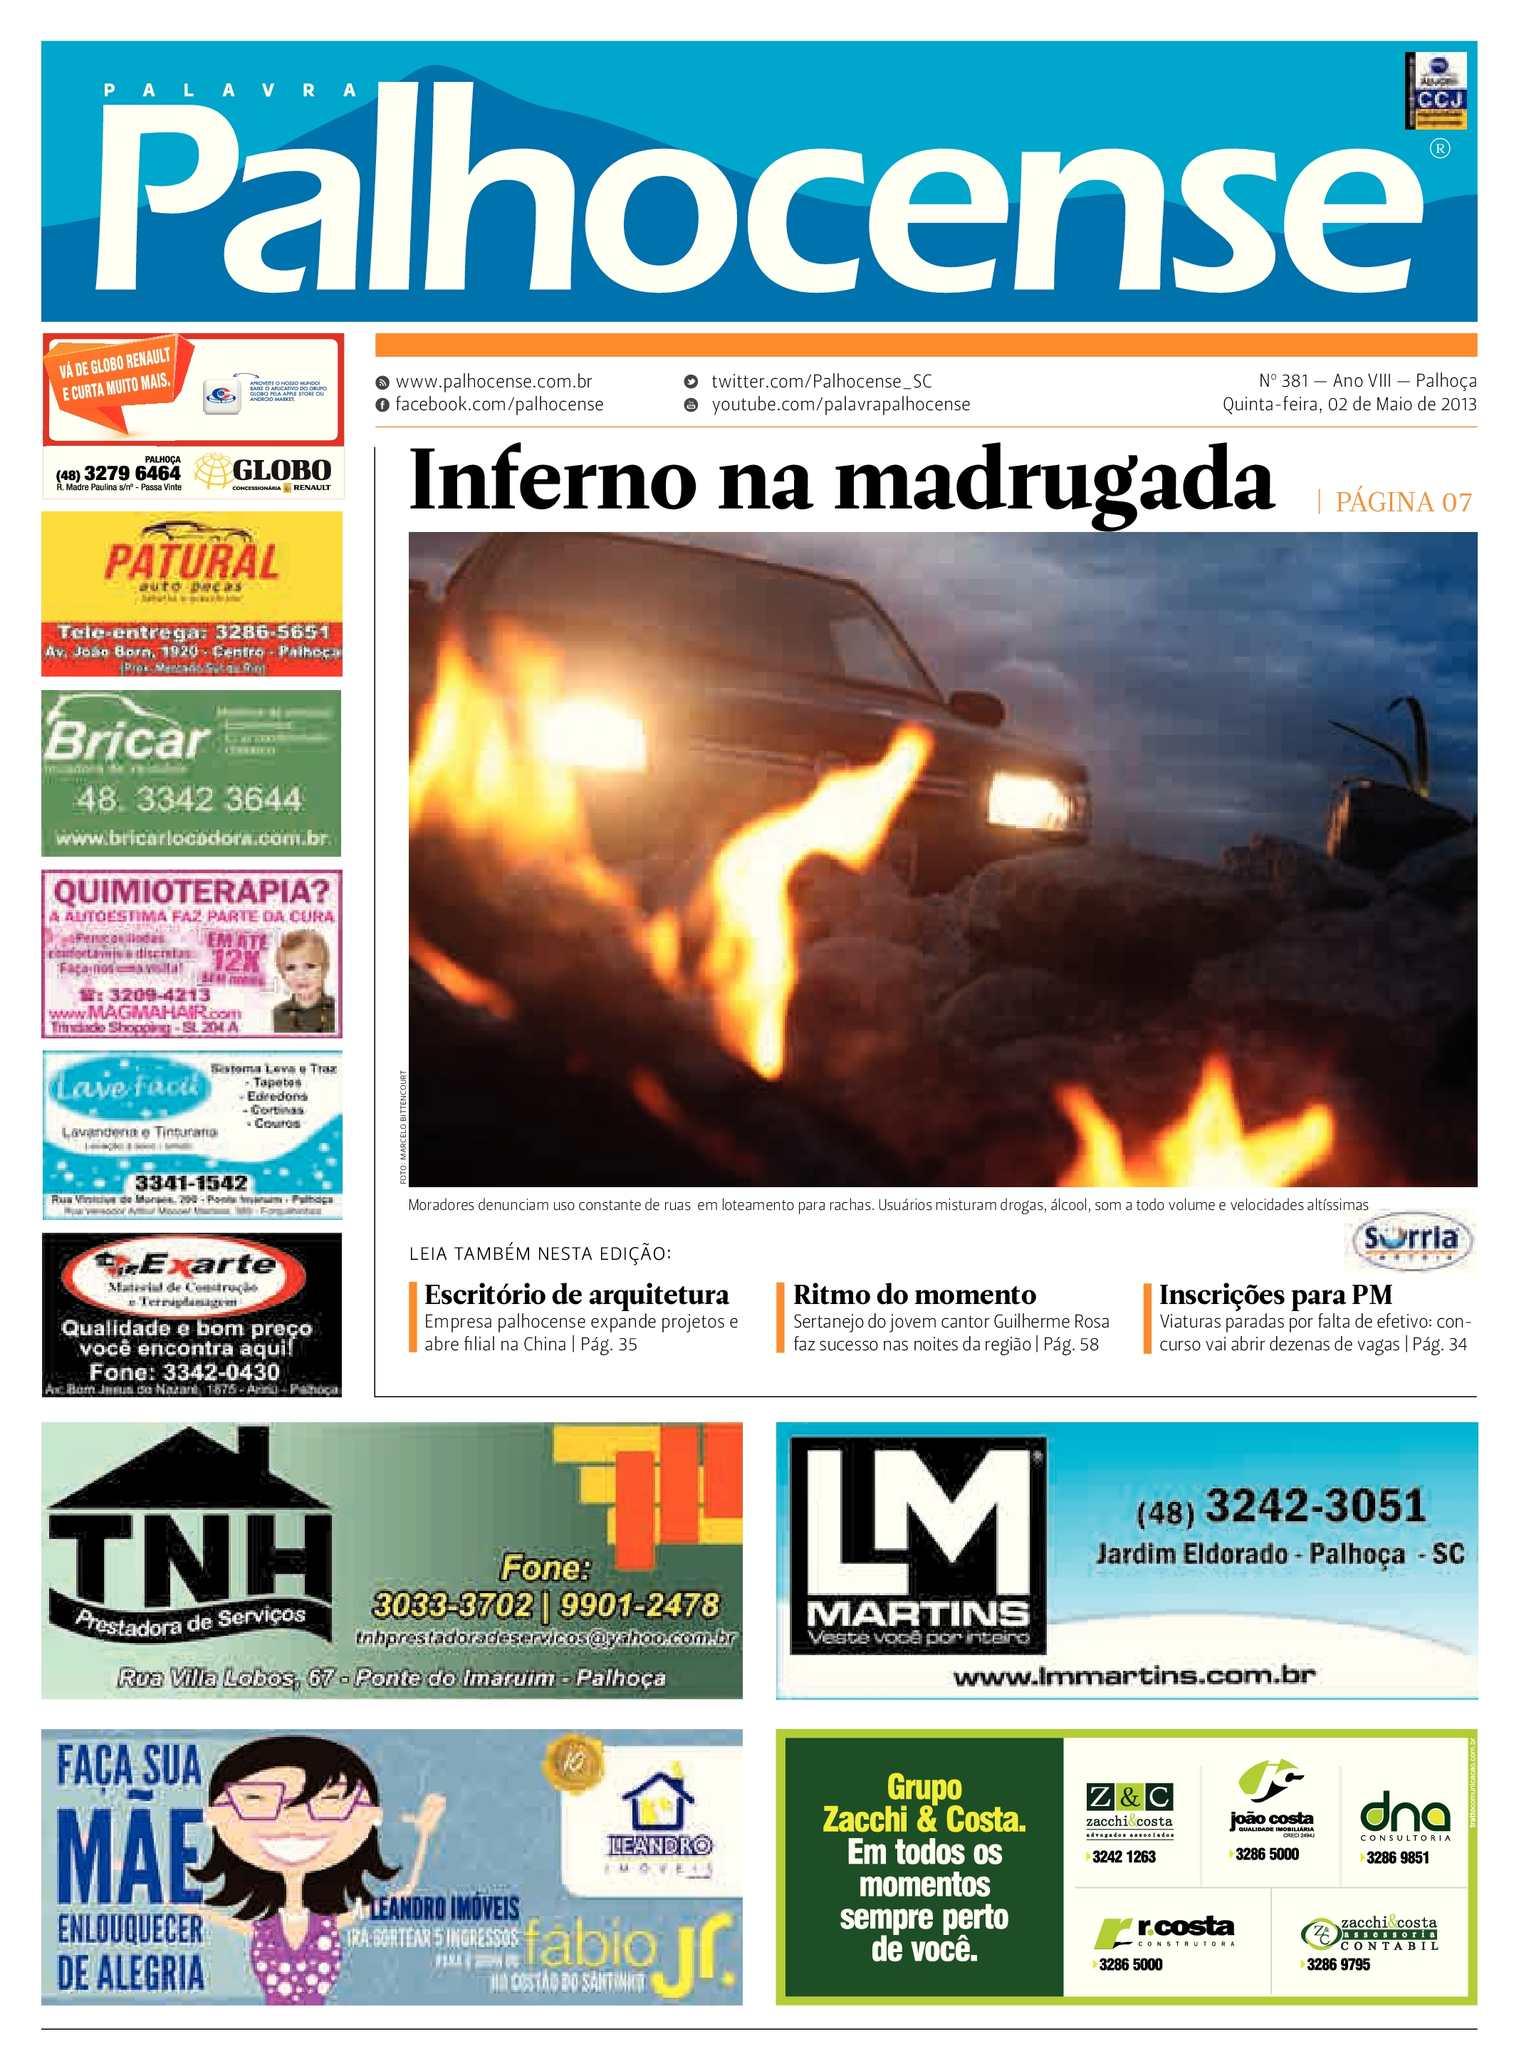 Calaméo - Jornal Palavra Palhocense - Edição 381 3bda3597010ed